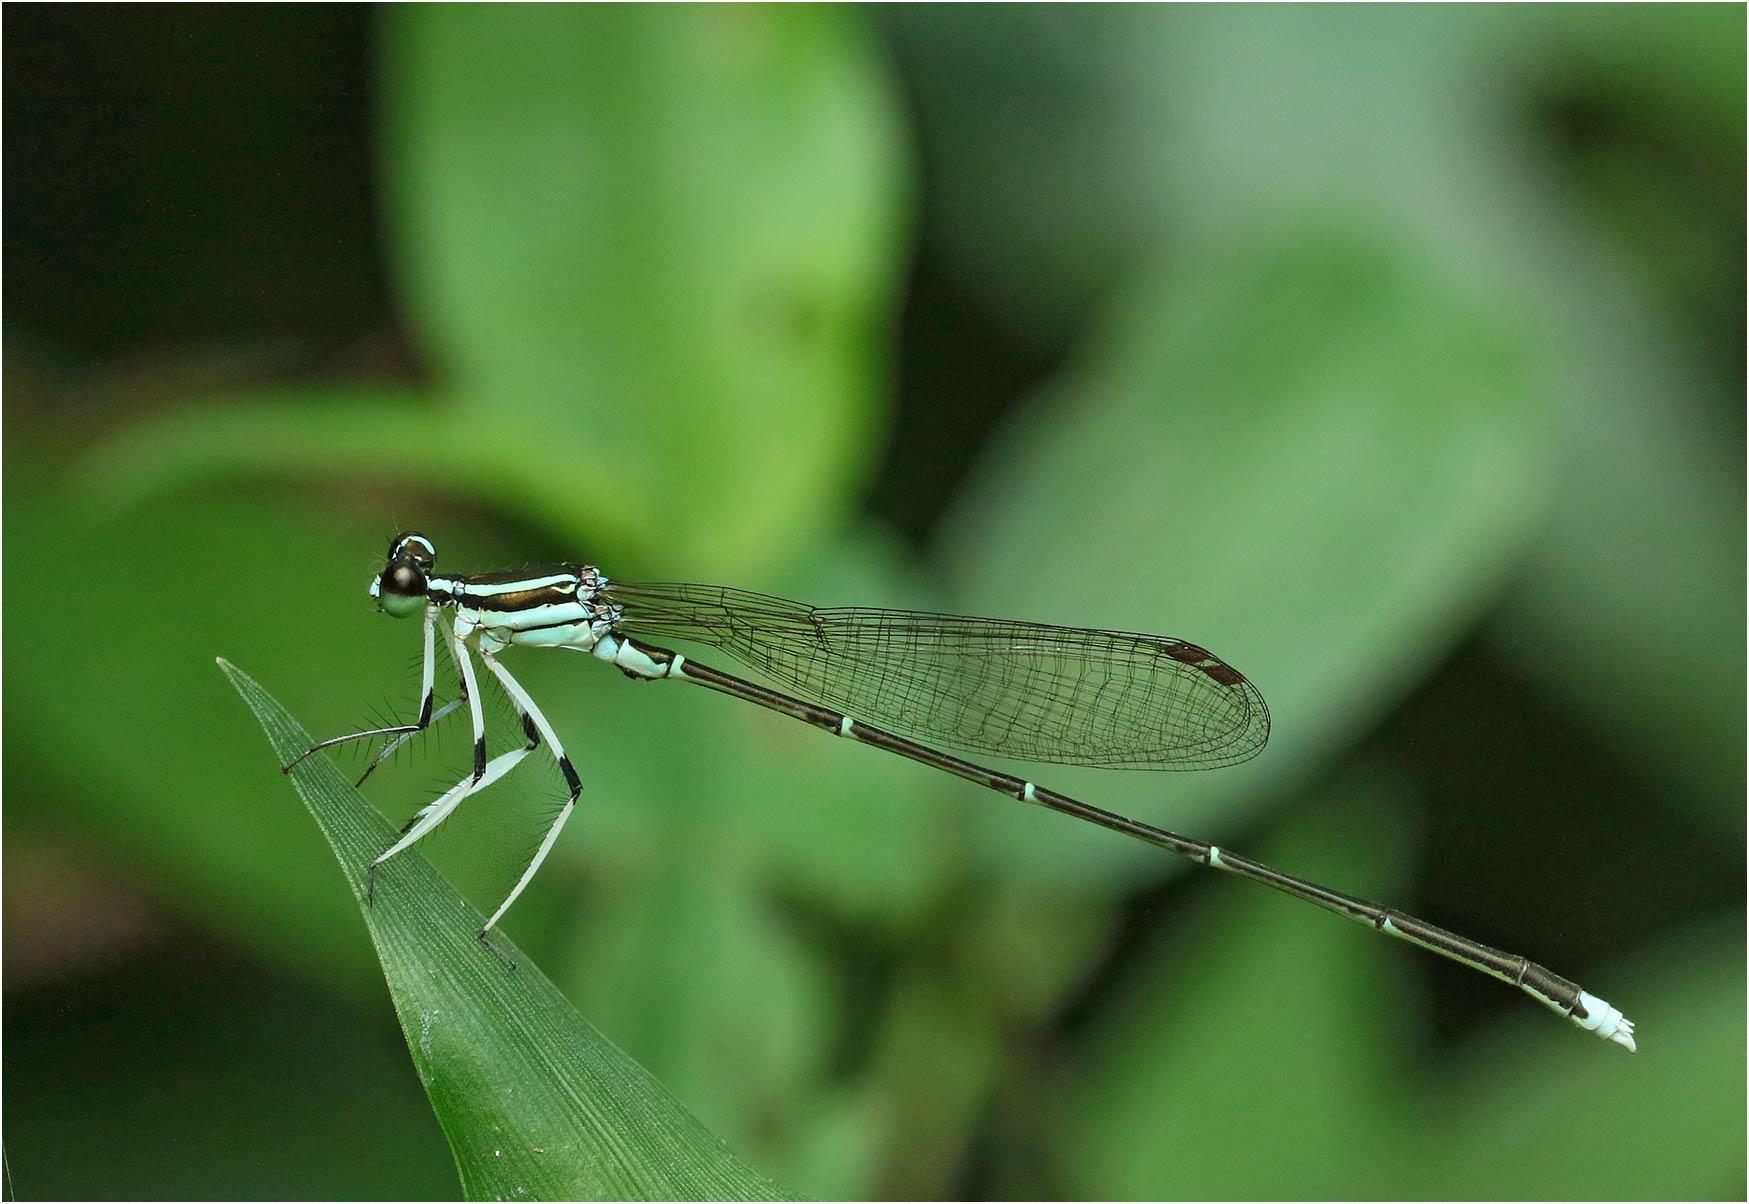 Pseudocopera ciliata mâle, Vietnam, Xuan Son, 08/06/2018